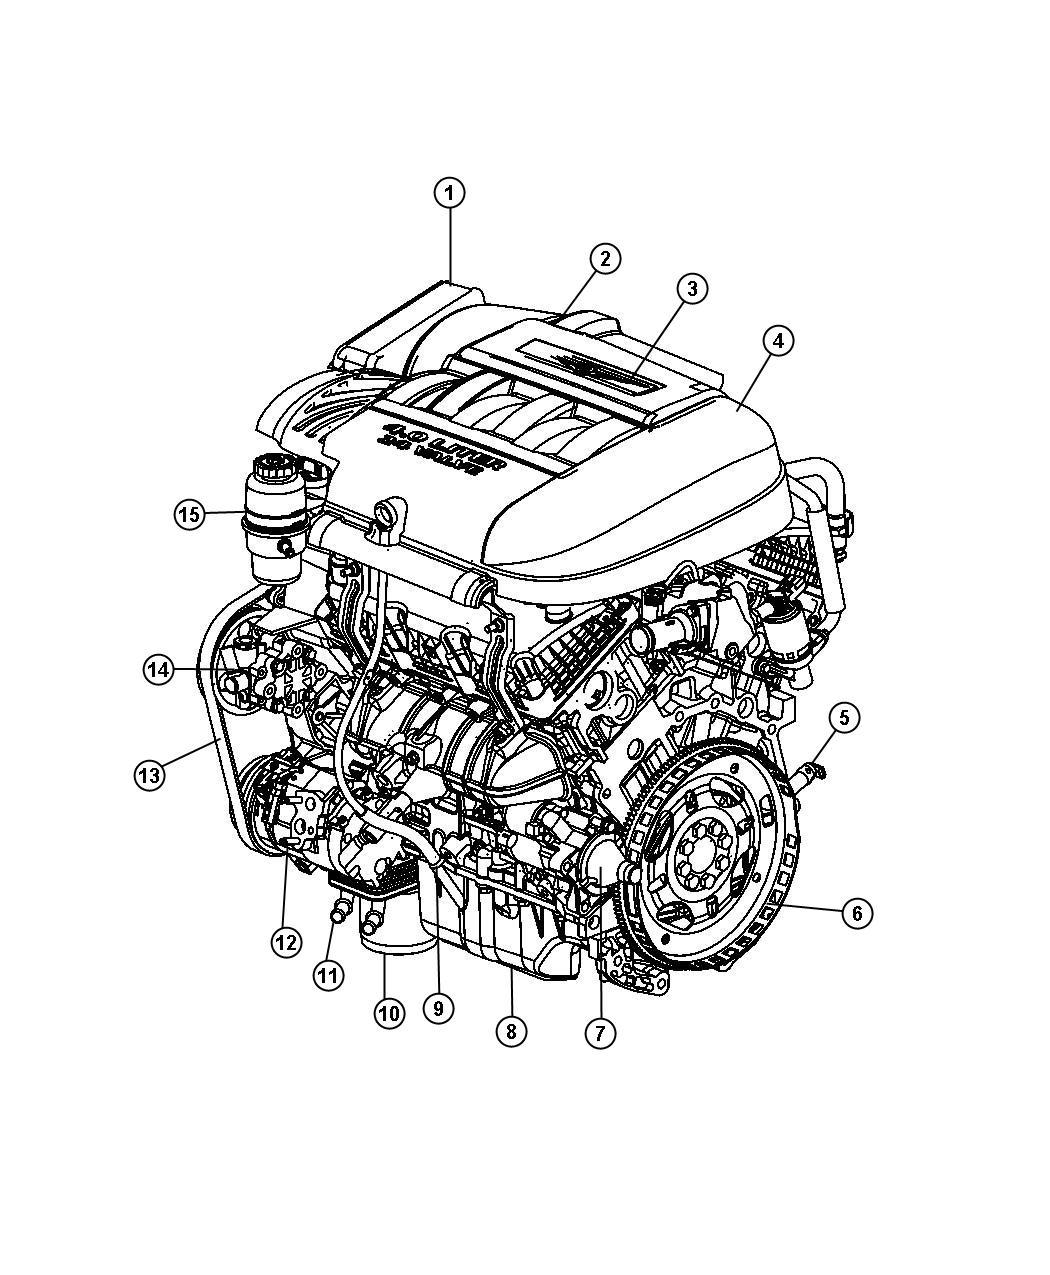 Diagram Chrysler Pacifica Engine Diagram Full